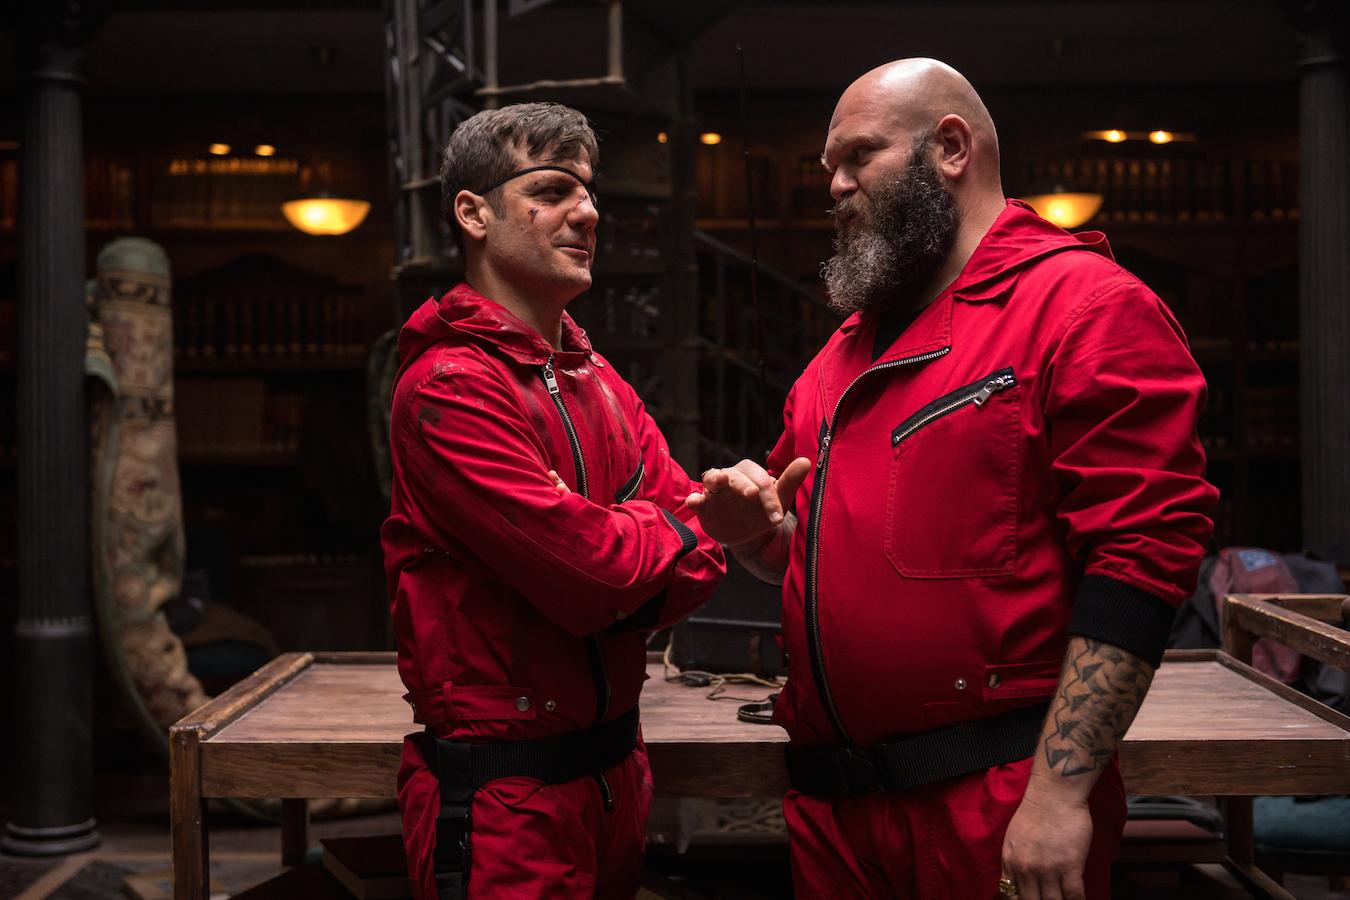 REVIEW: Season 3 of 'La Casa de Papel' Is More of the Same – Only Bigger & Bolder